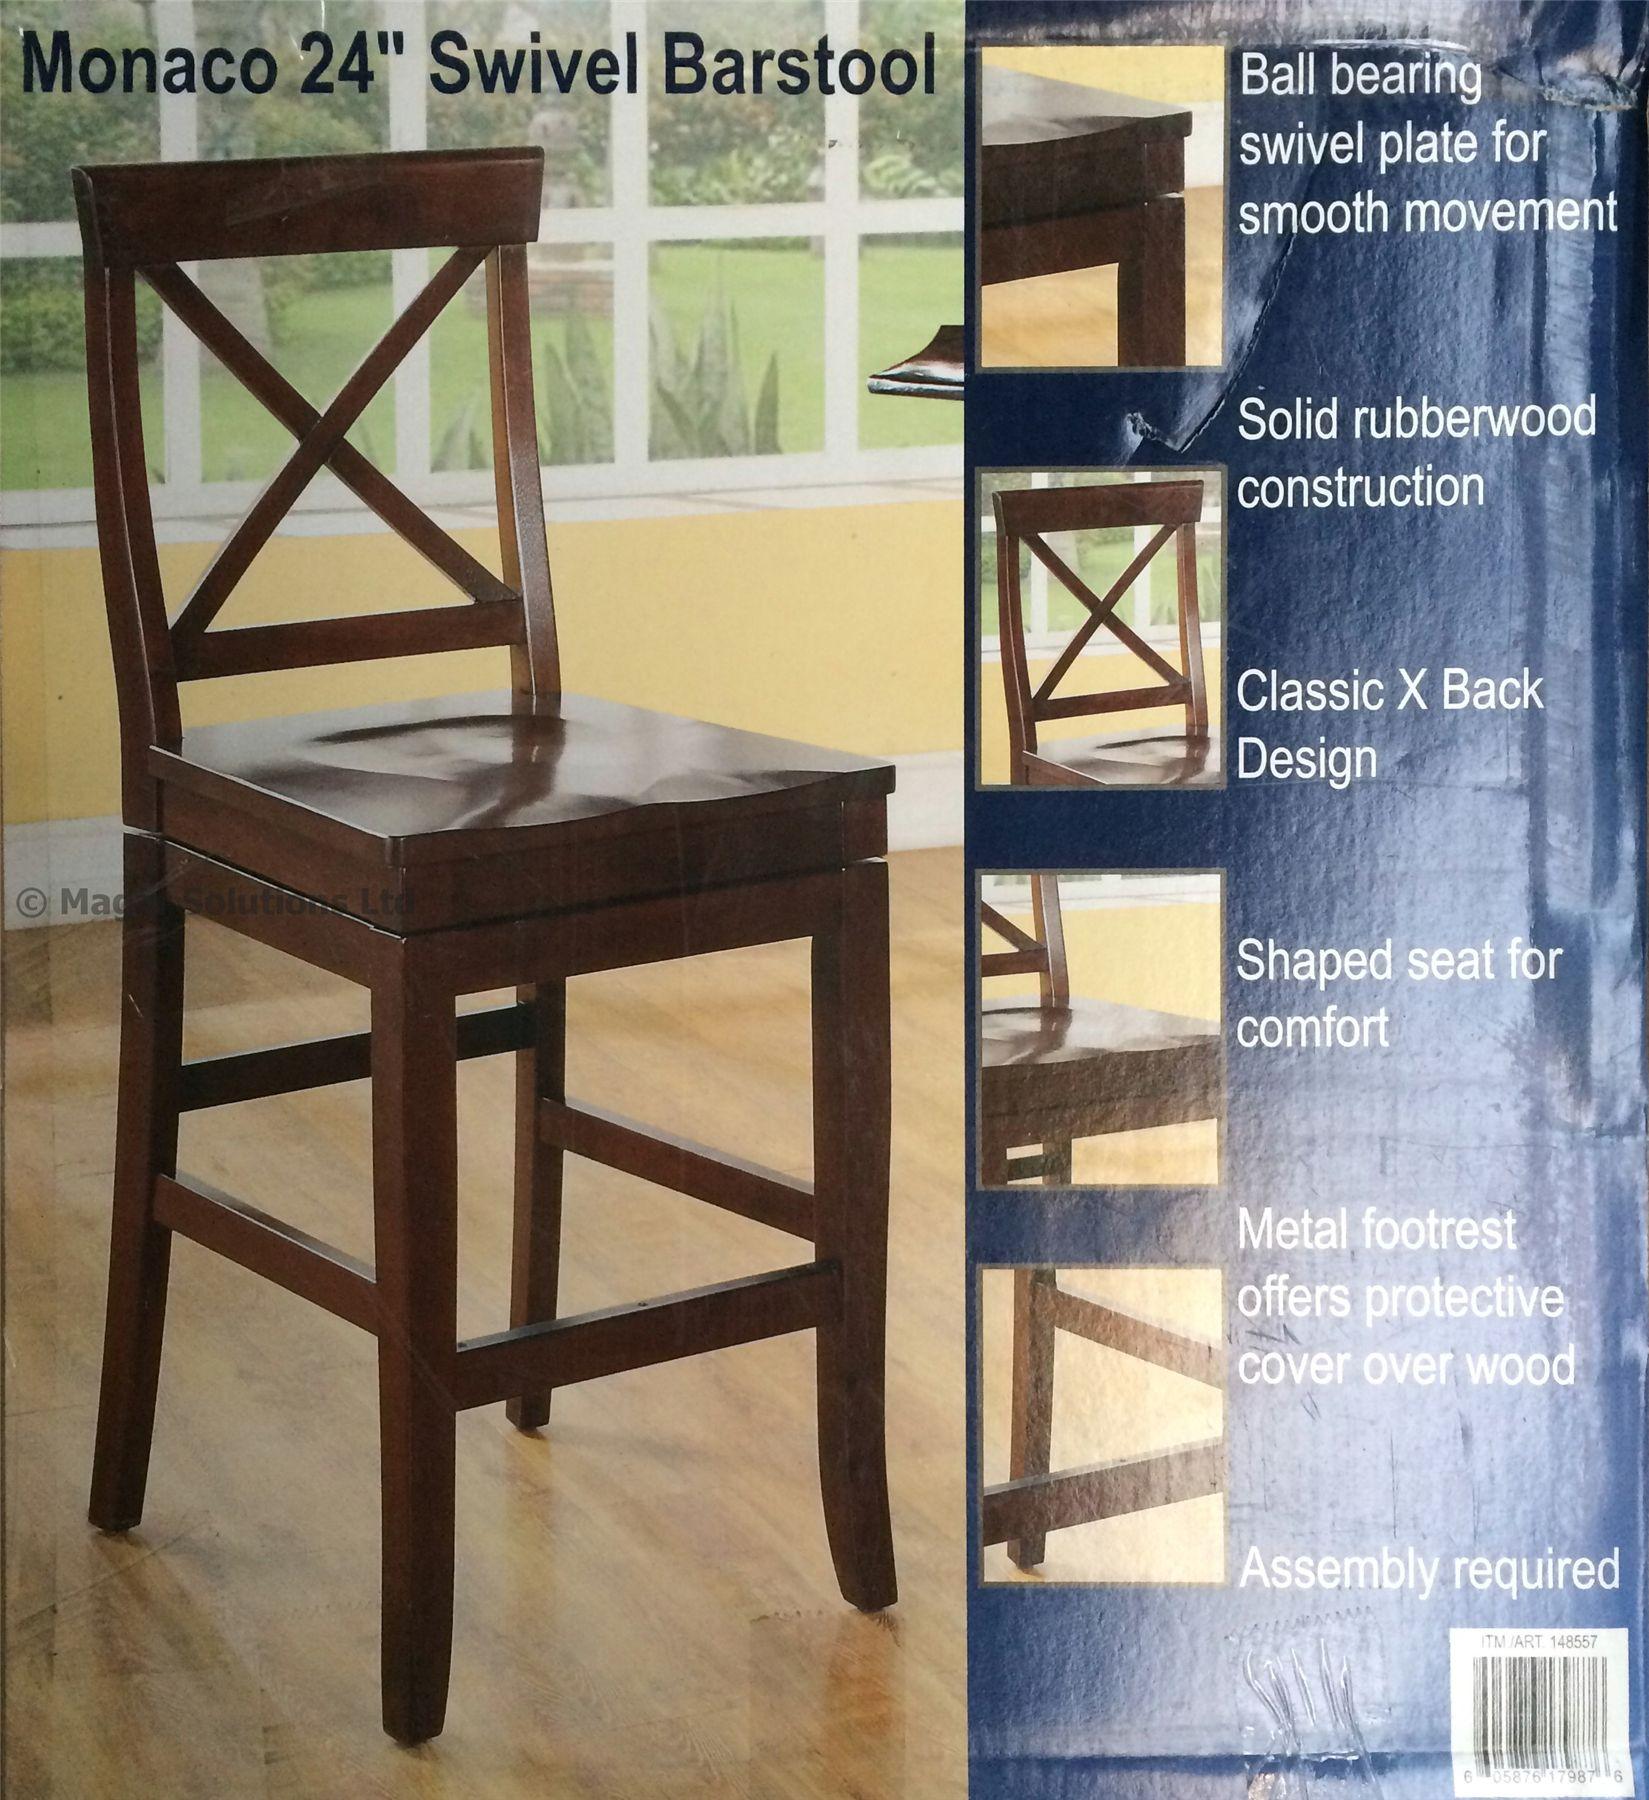 "Wooden Revolving Stool Light Brown Swivel Bar Pub Chair: Monaco 24"" Wooden Dark Brown Swivel Bar Stool Solid Rubber"